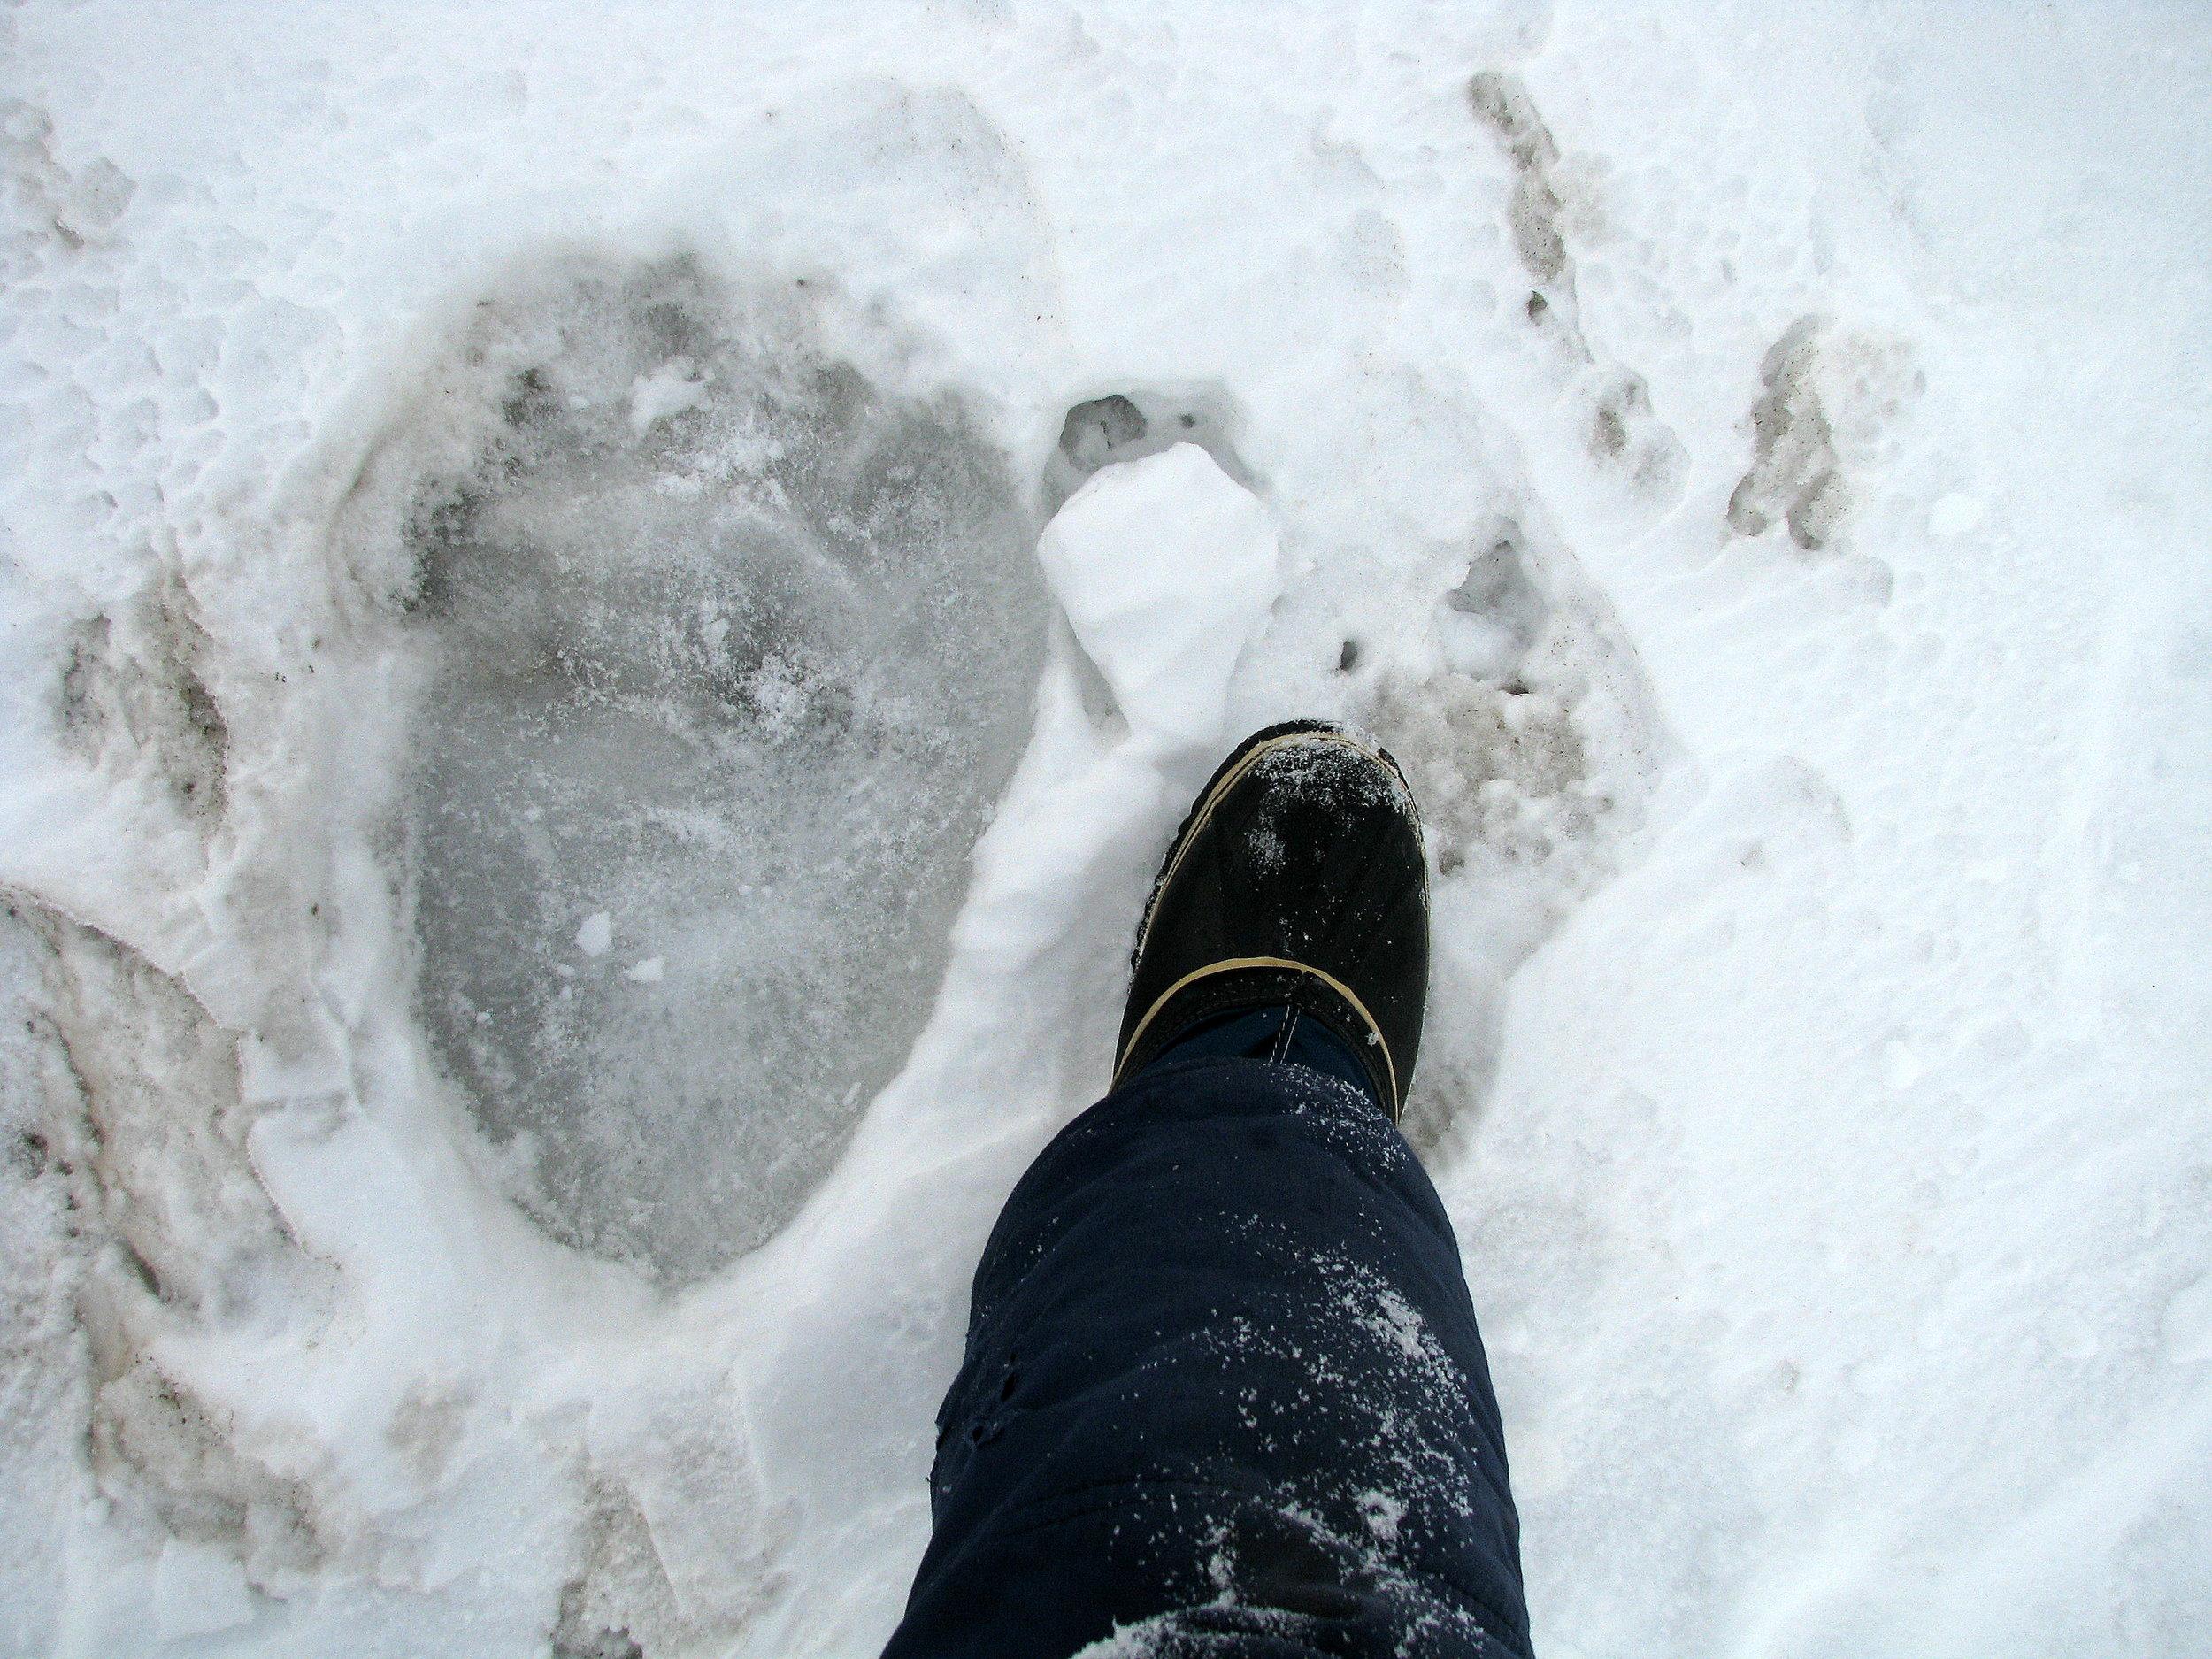 This frozen track reveals the imposing size of a polar bear, on the sea ice near Kaktovik, Arctic Alaska.